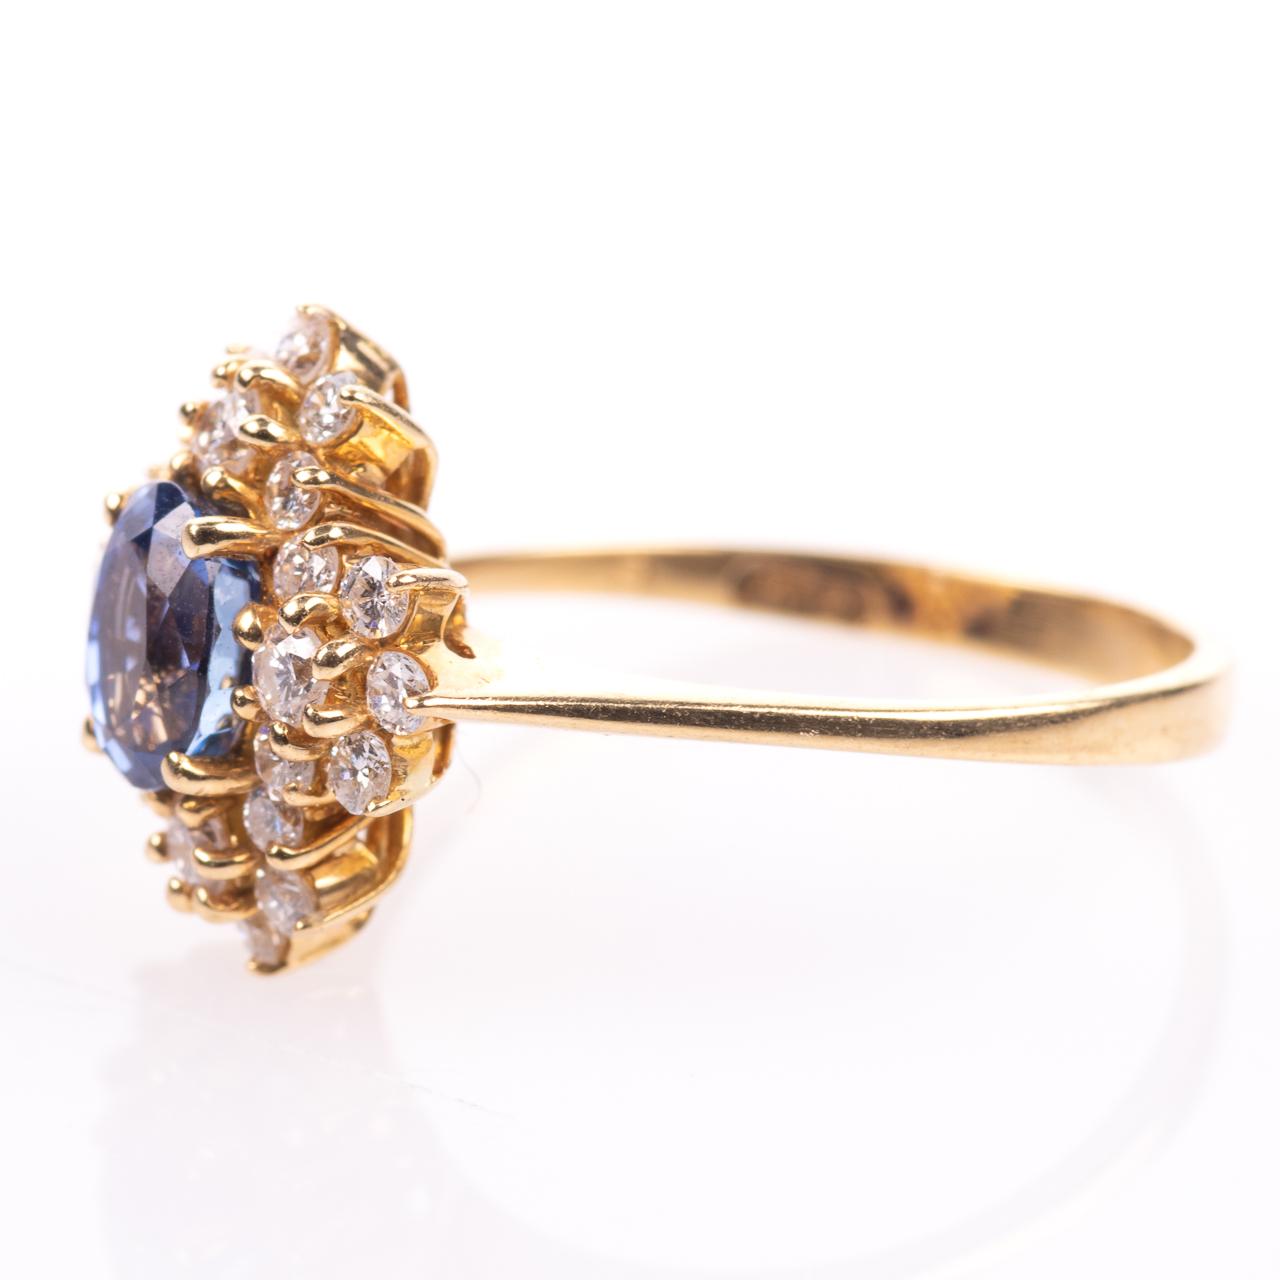 18ct Gold 1ct Sapphire & 0.70ct Diamond Ring - Image 4 of 8